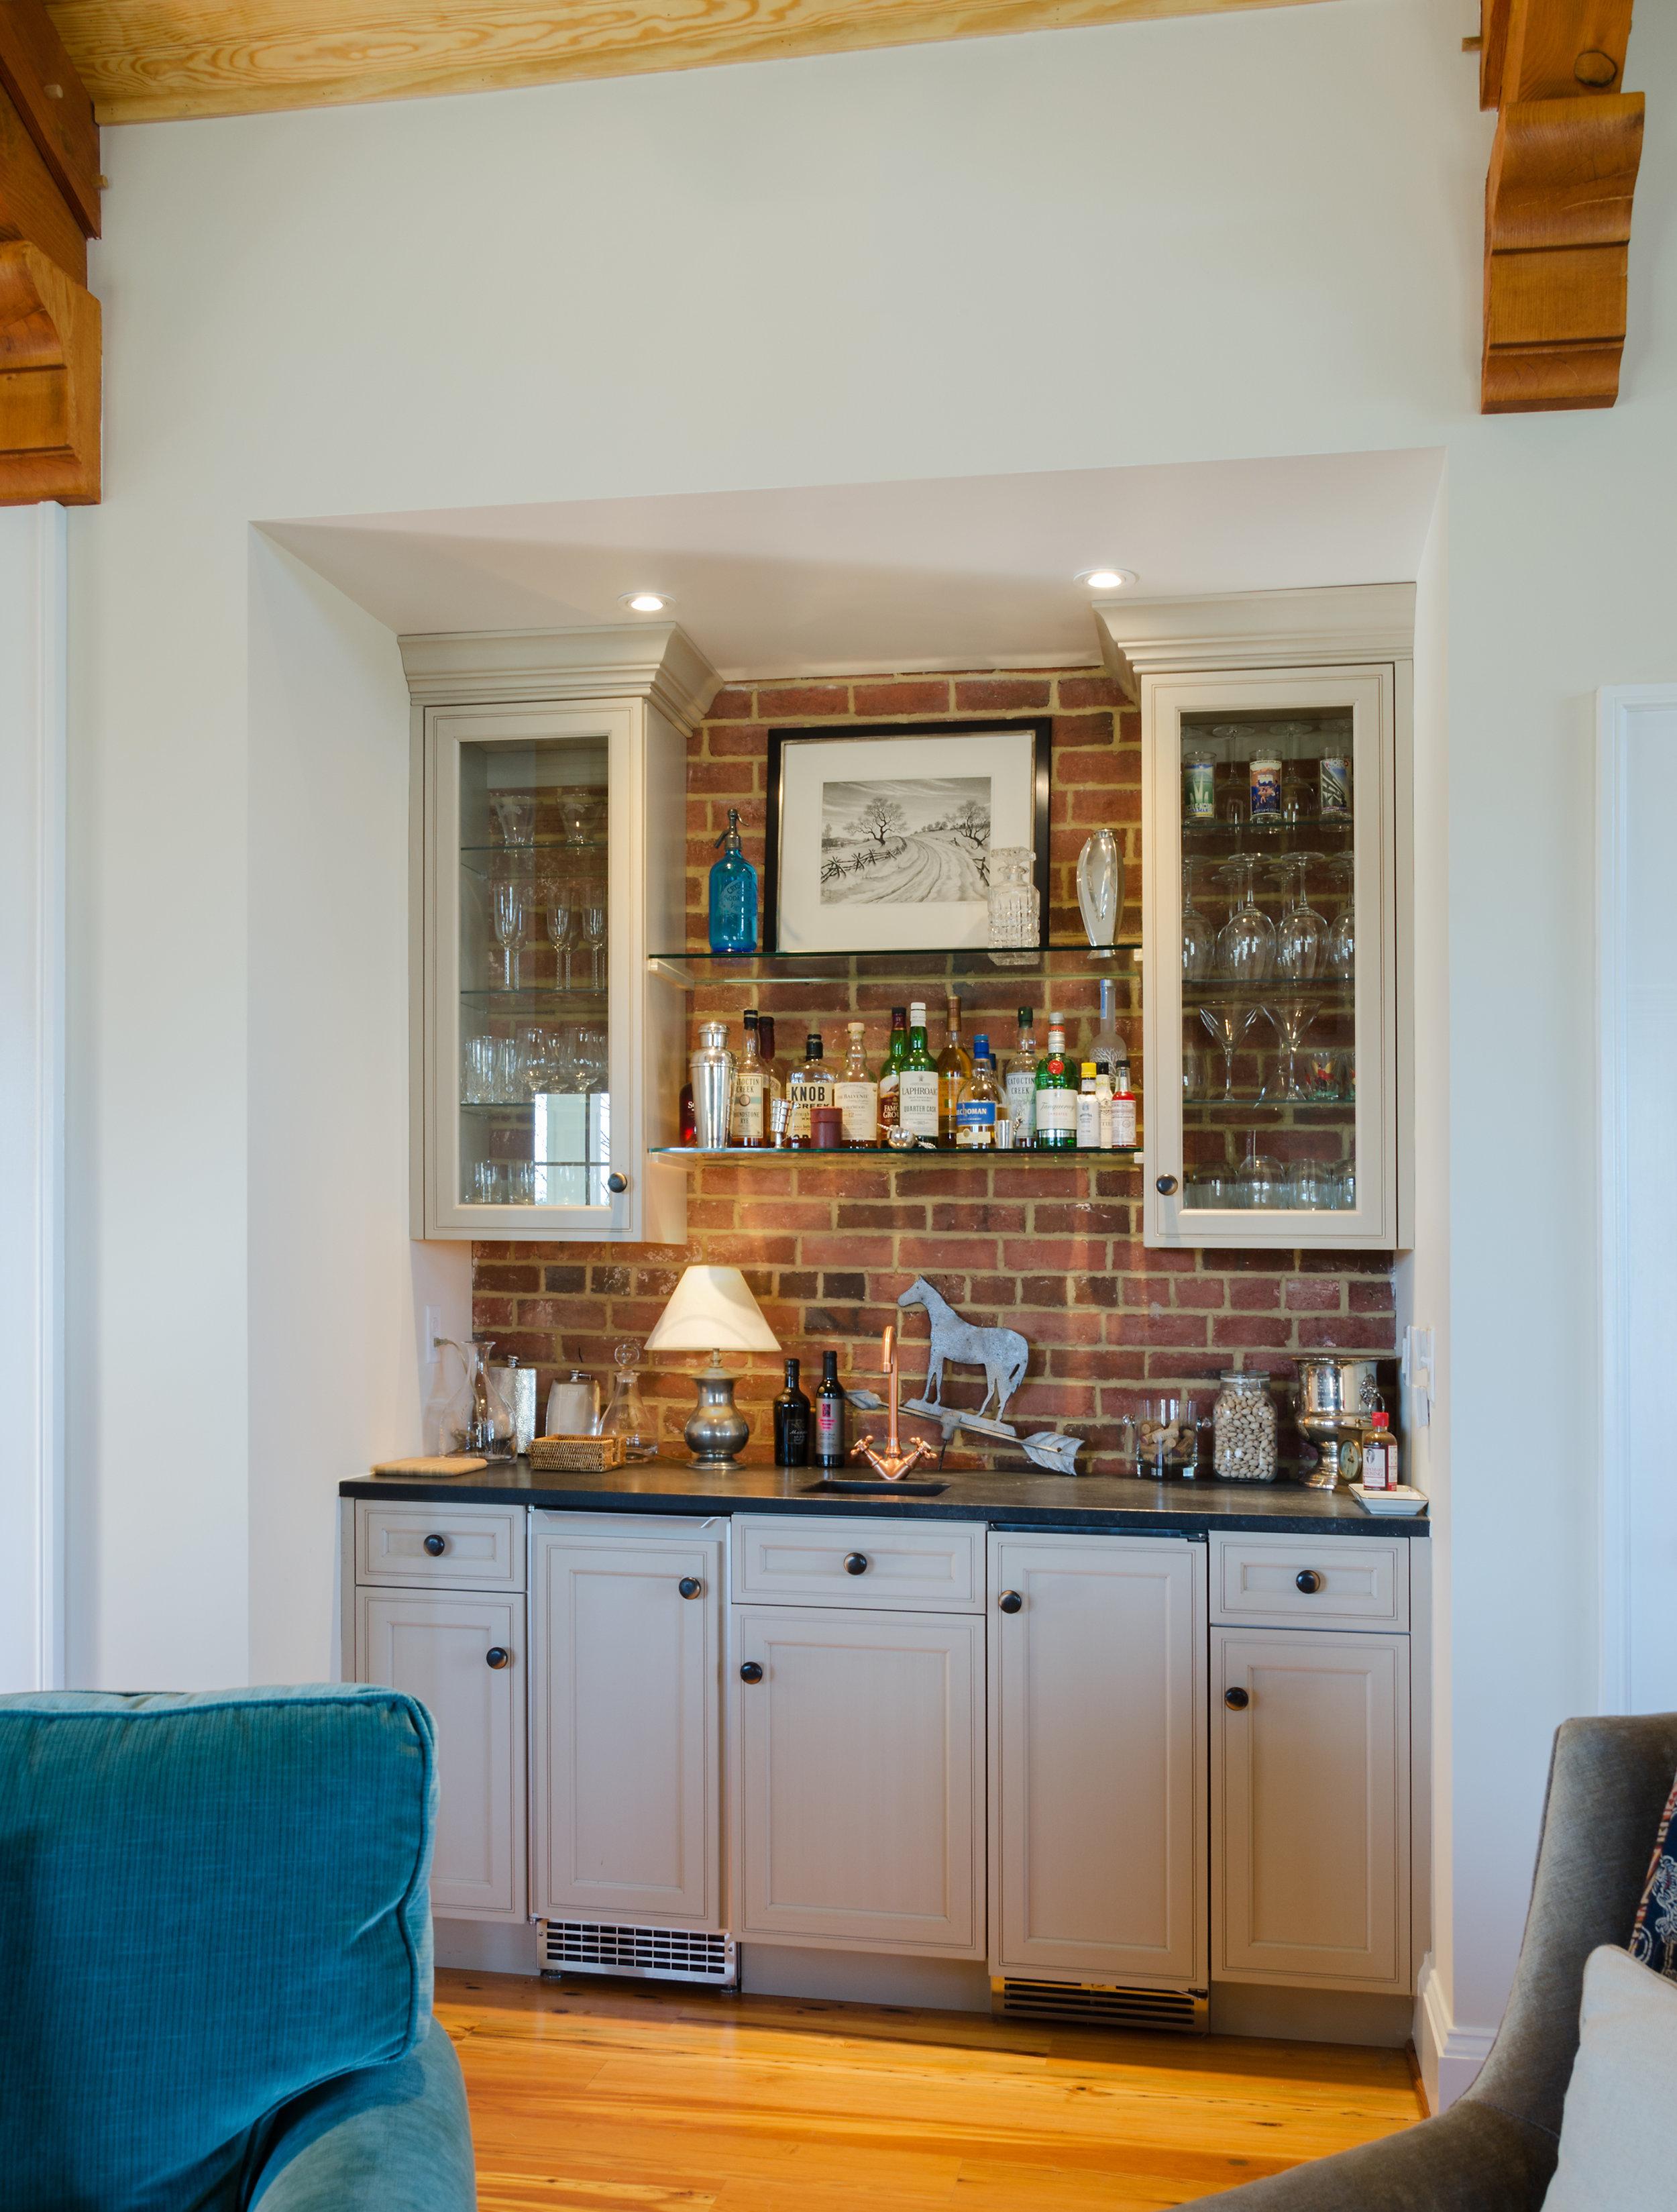 CKI-Thomson-Kitchen-6-1132016.jpg